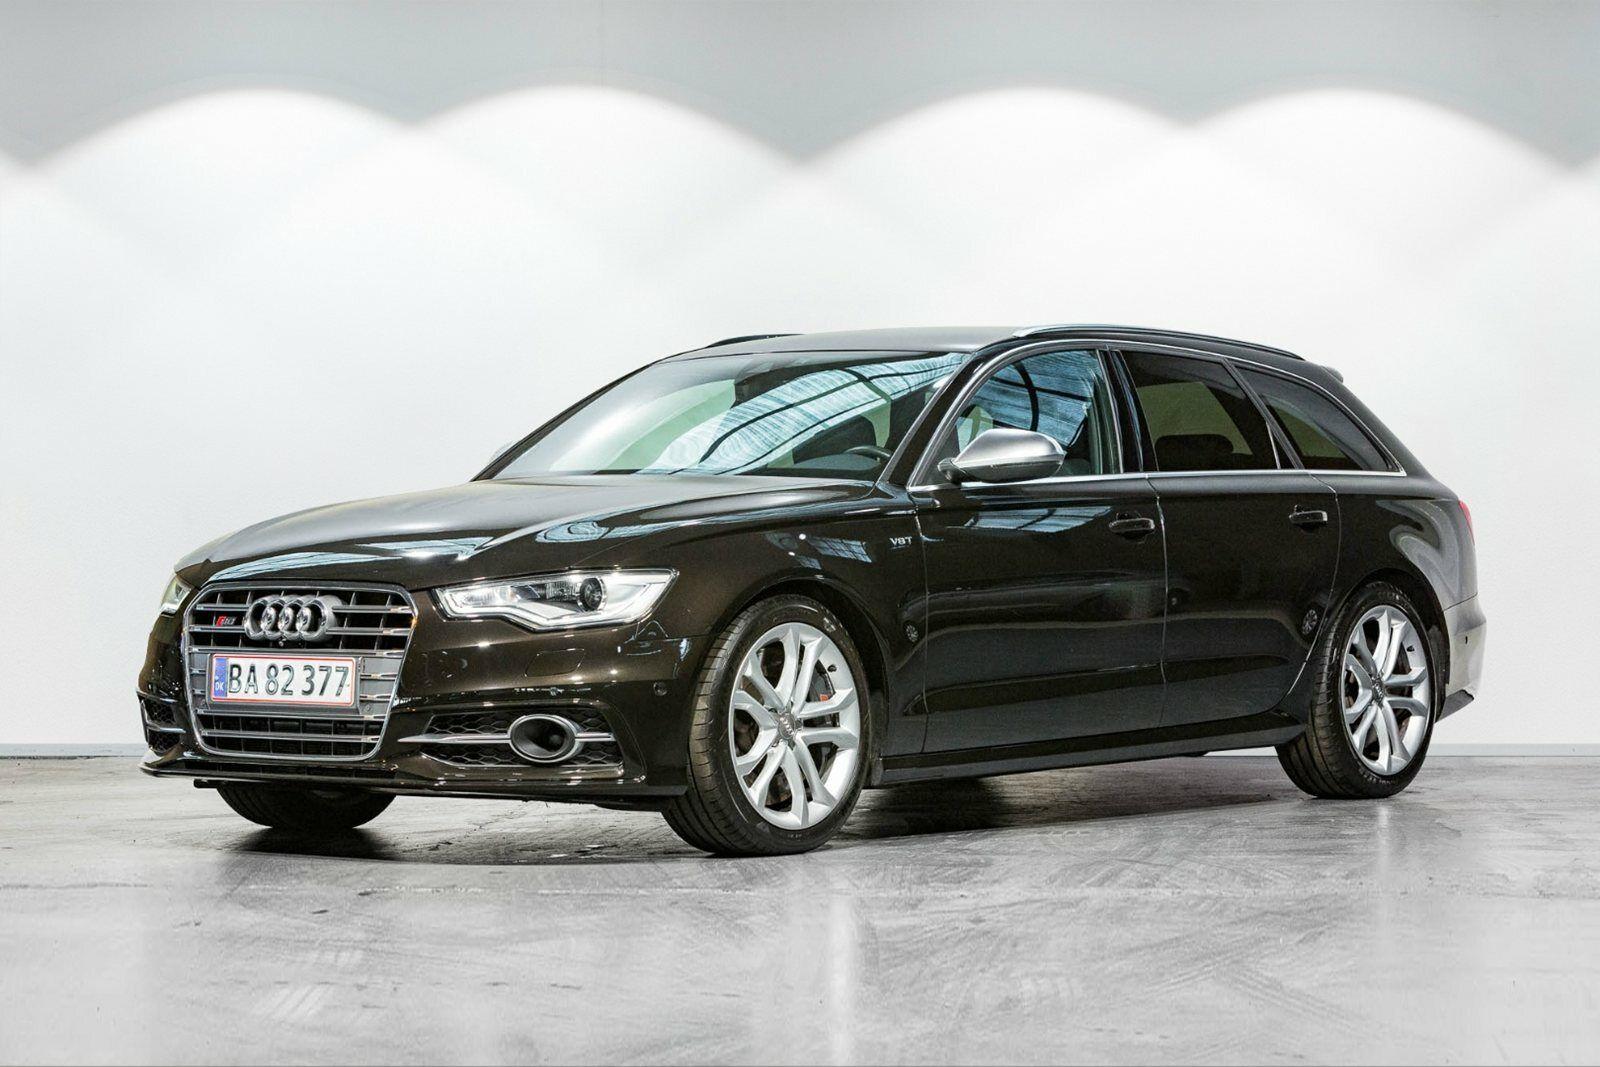 Audi S6 4,0 TFSi Avant quattro S-tr. 5d - 599.900 kr.